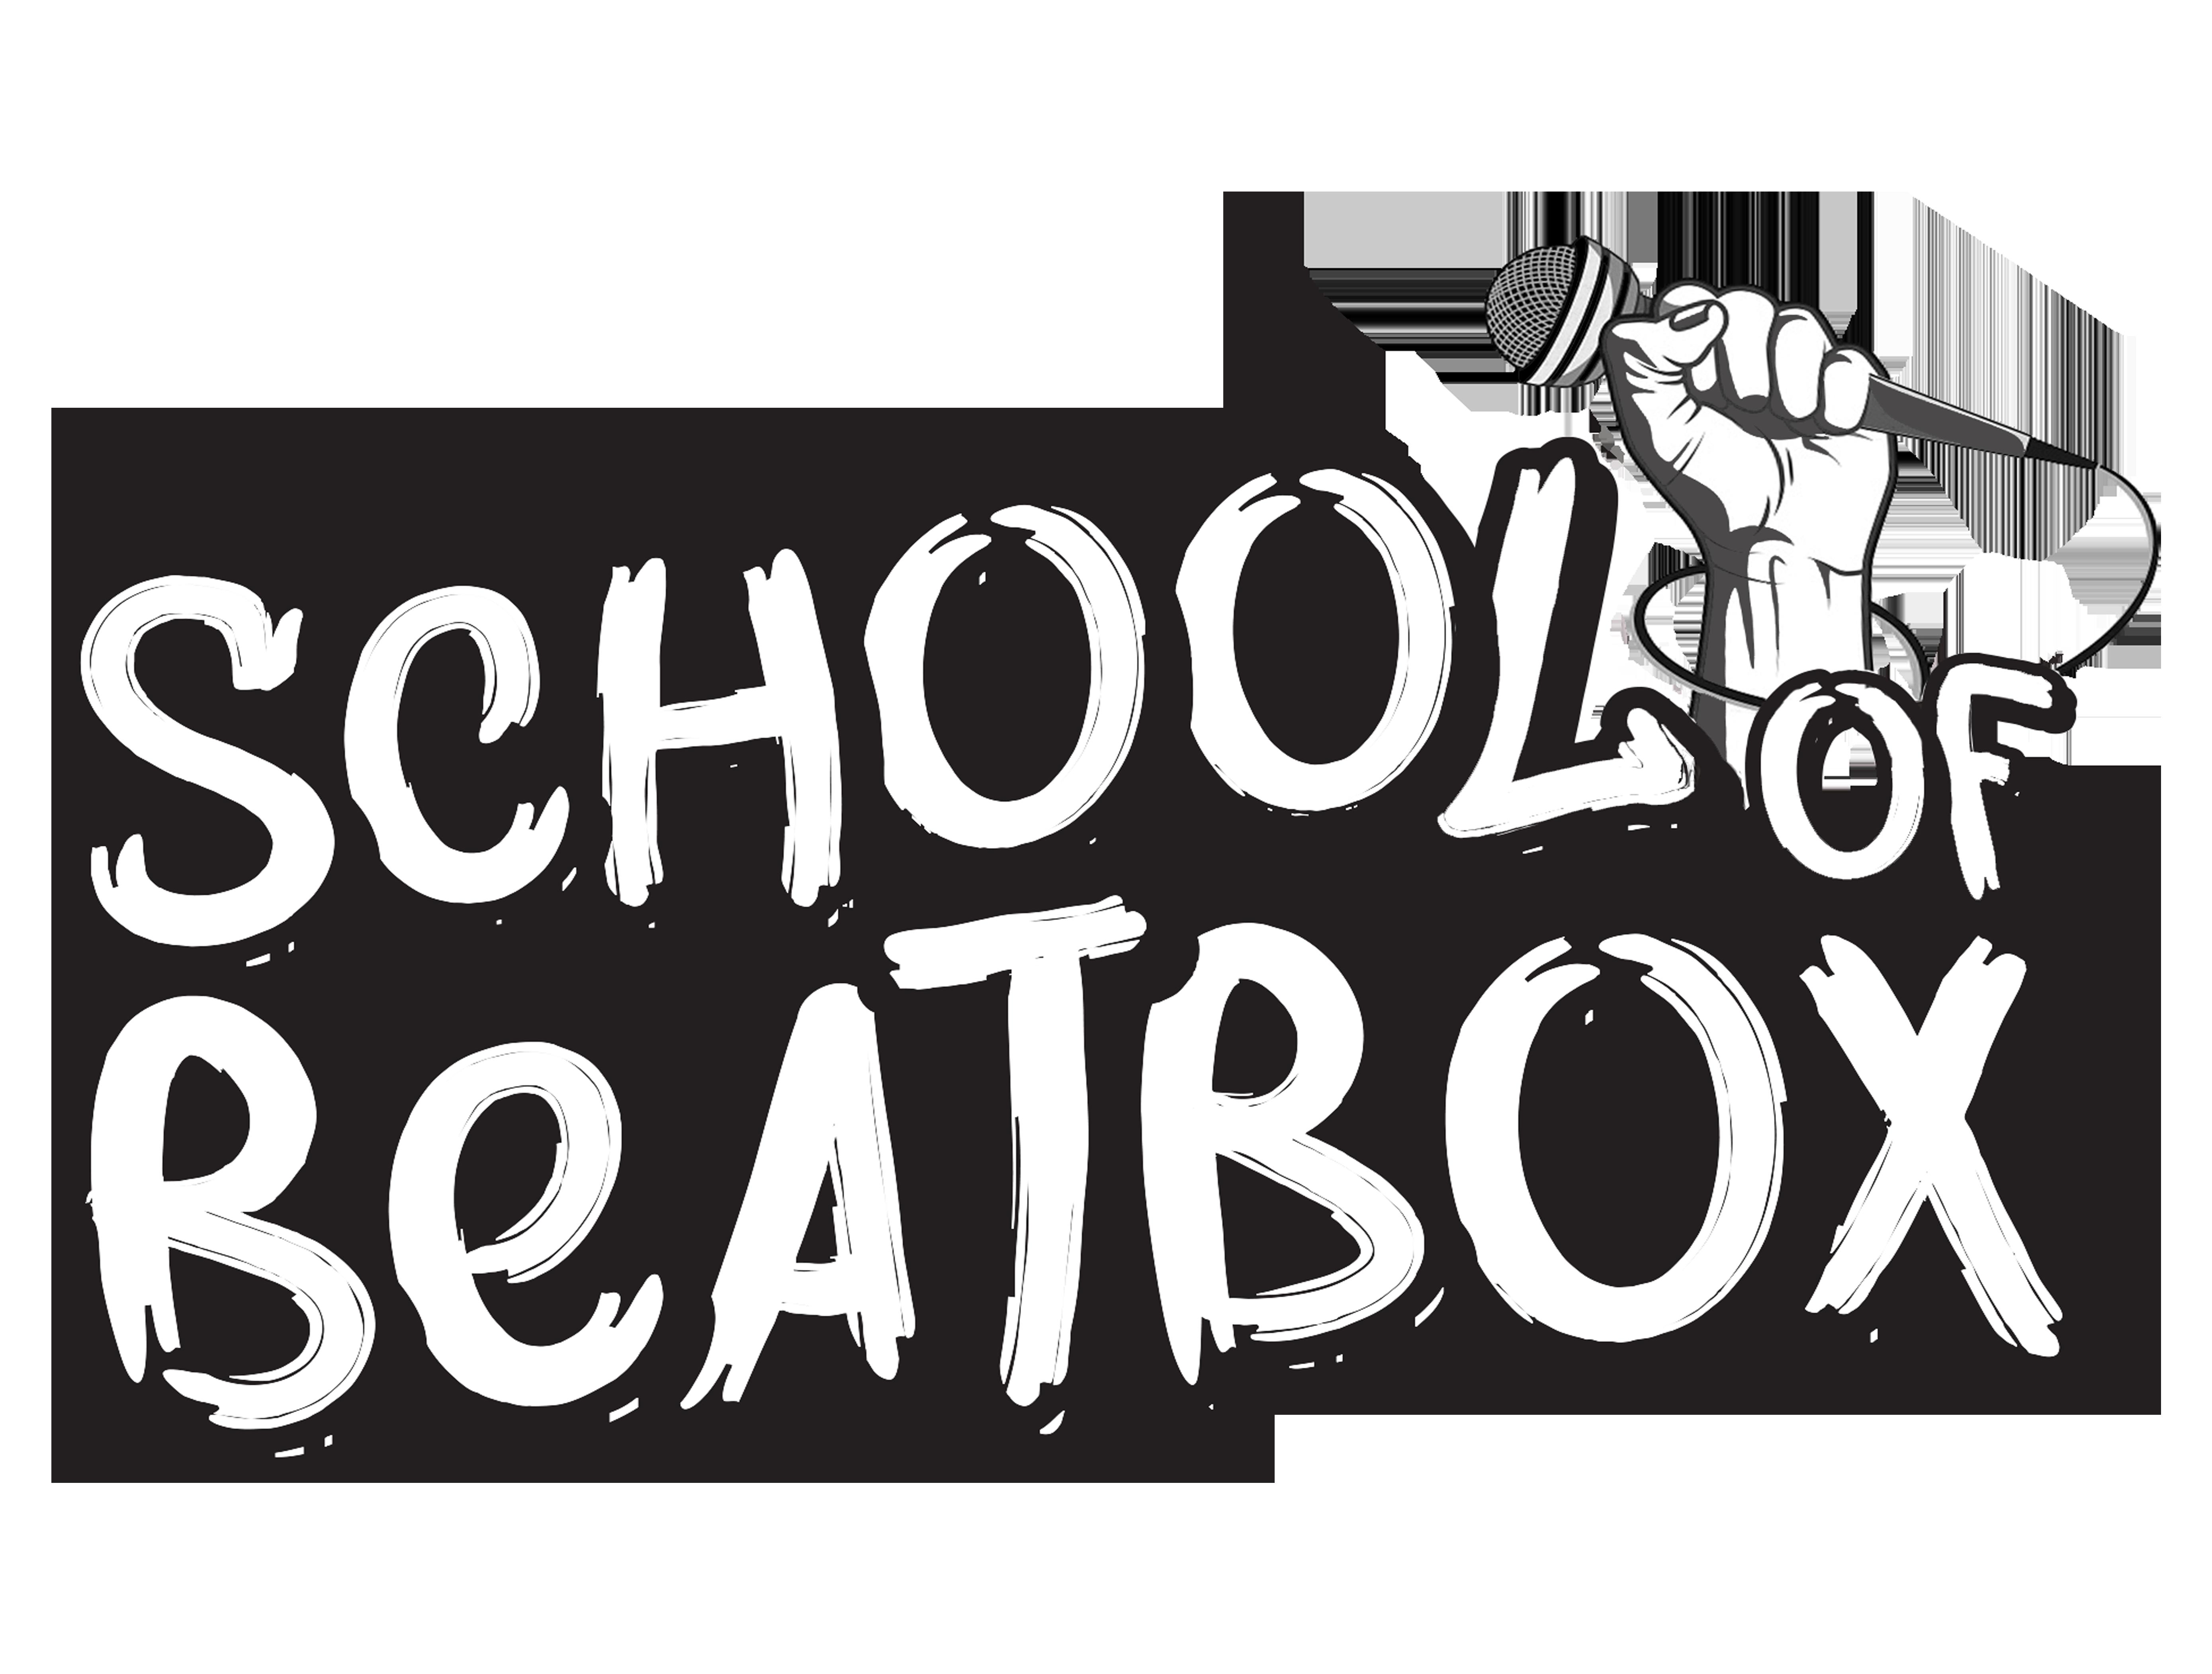 Beatbox Workshop - Beginner